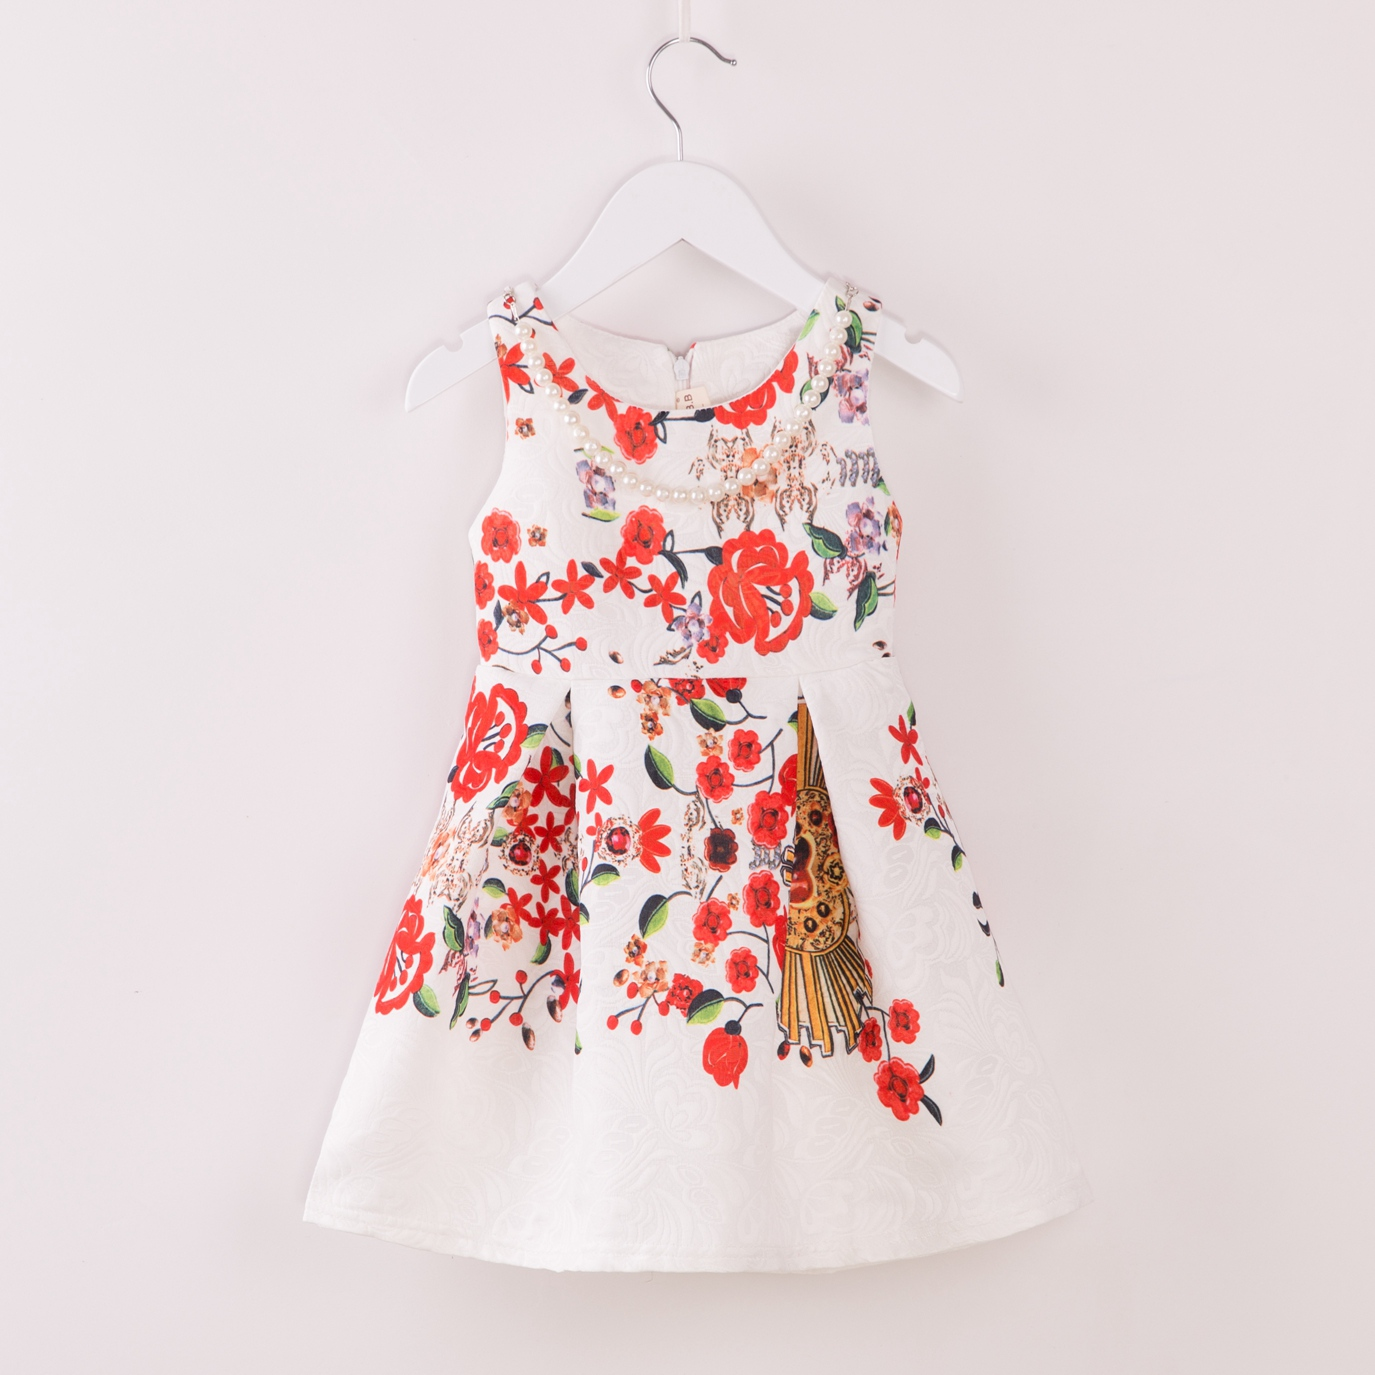 Aliexpress Com Buy Toddler Children Girls Clothing